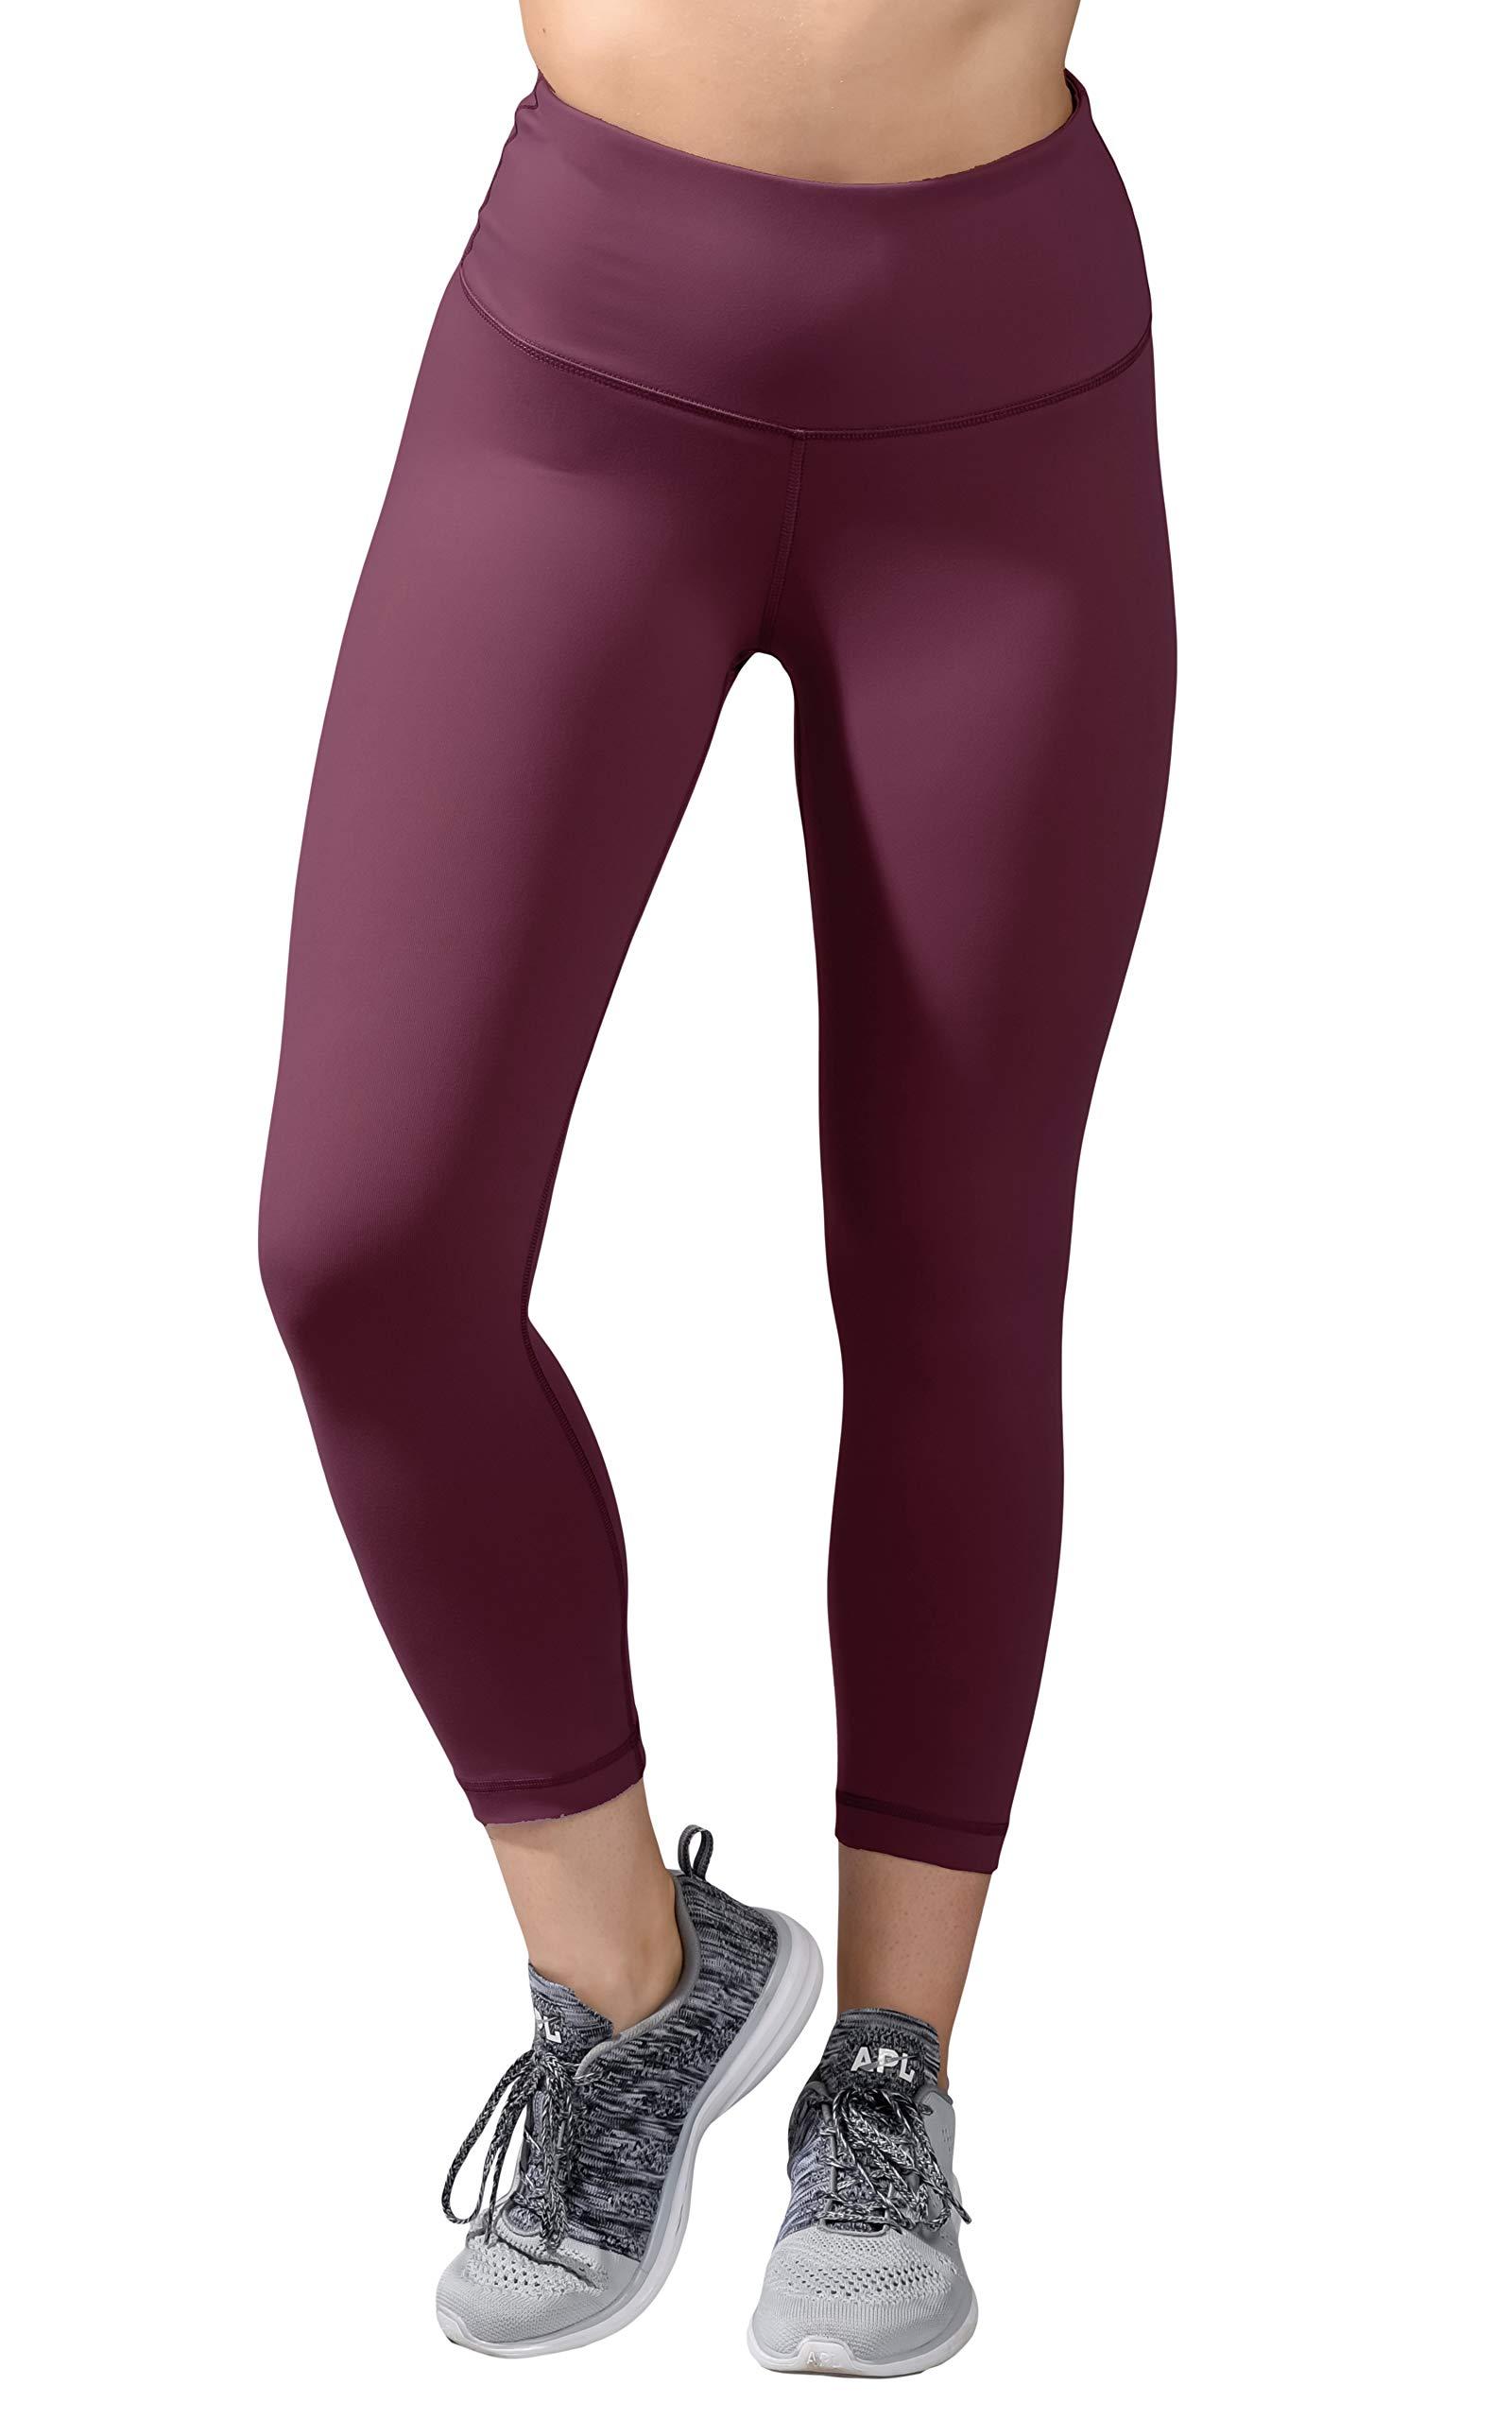 90 Degree By Reflex - High Waist Tummy Control Shapewear - Power Flex Capri - Prune - XS by 90 Degree By Reflex